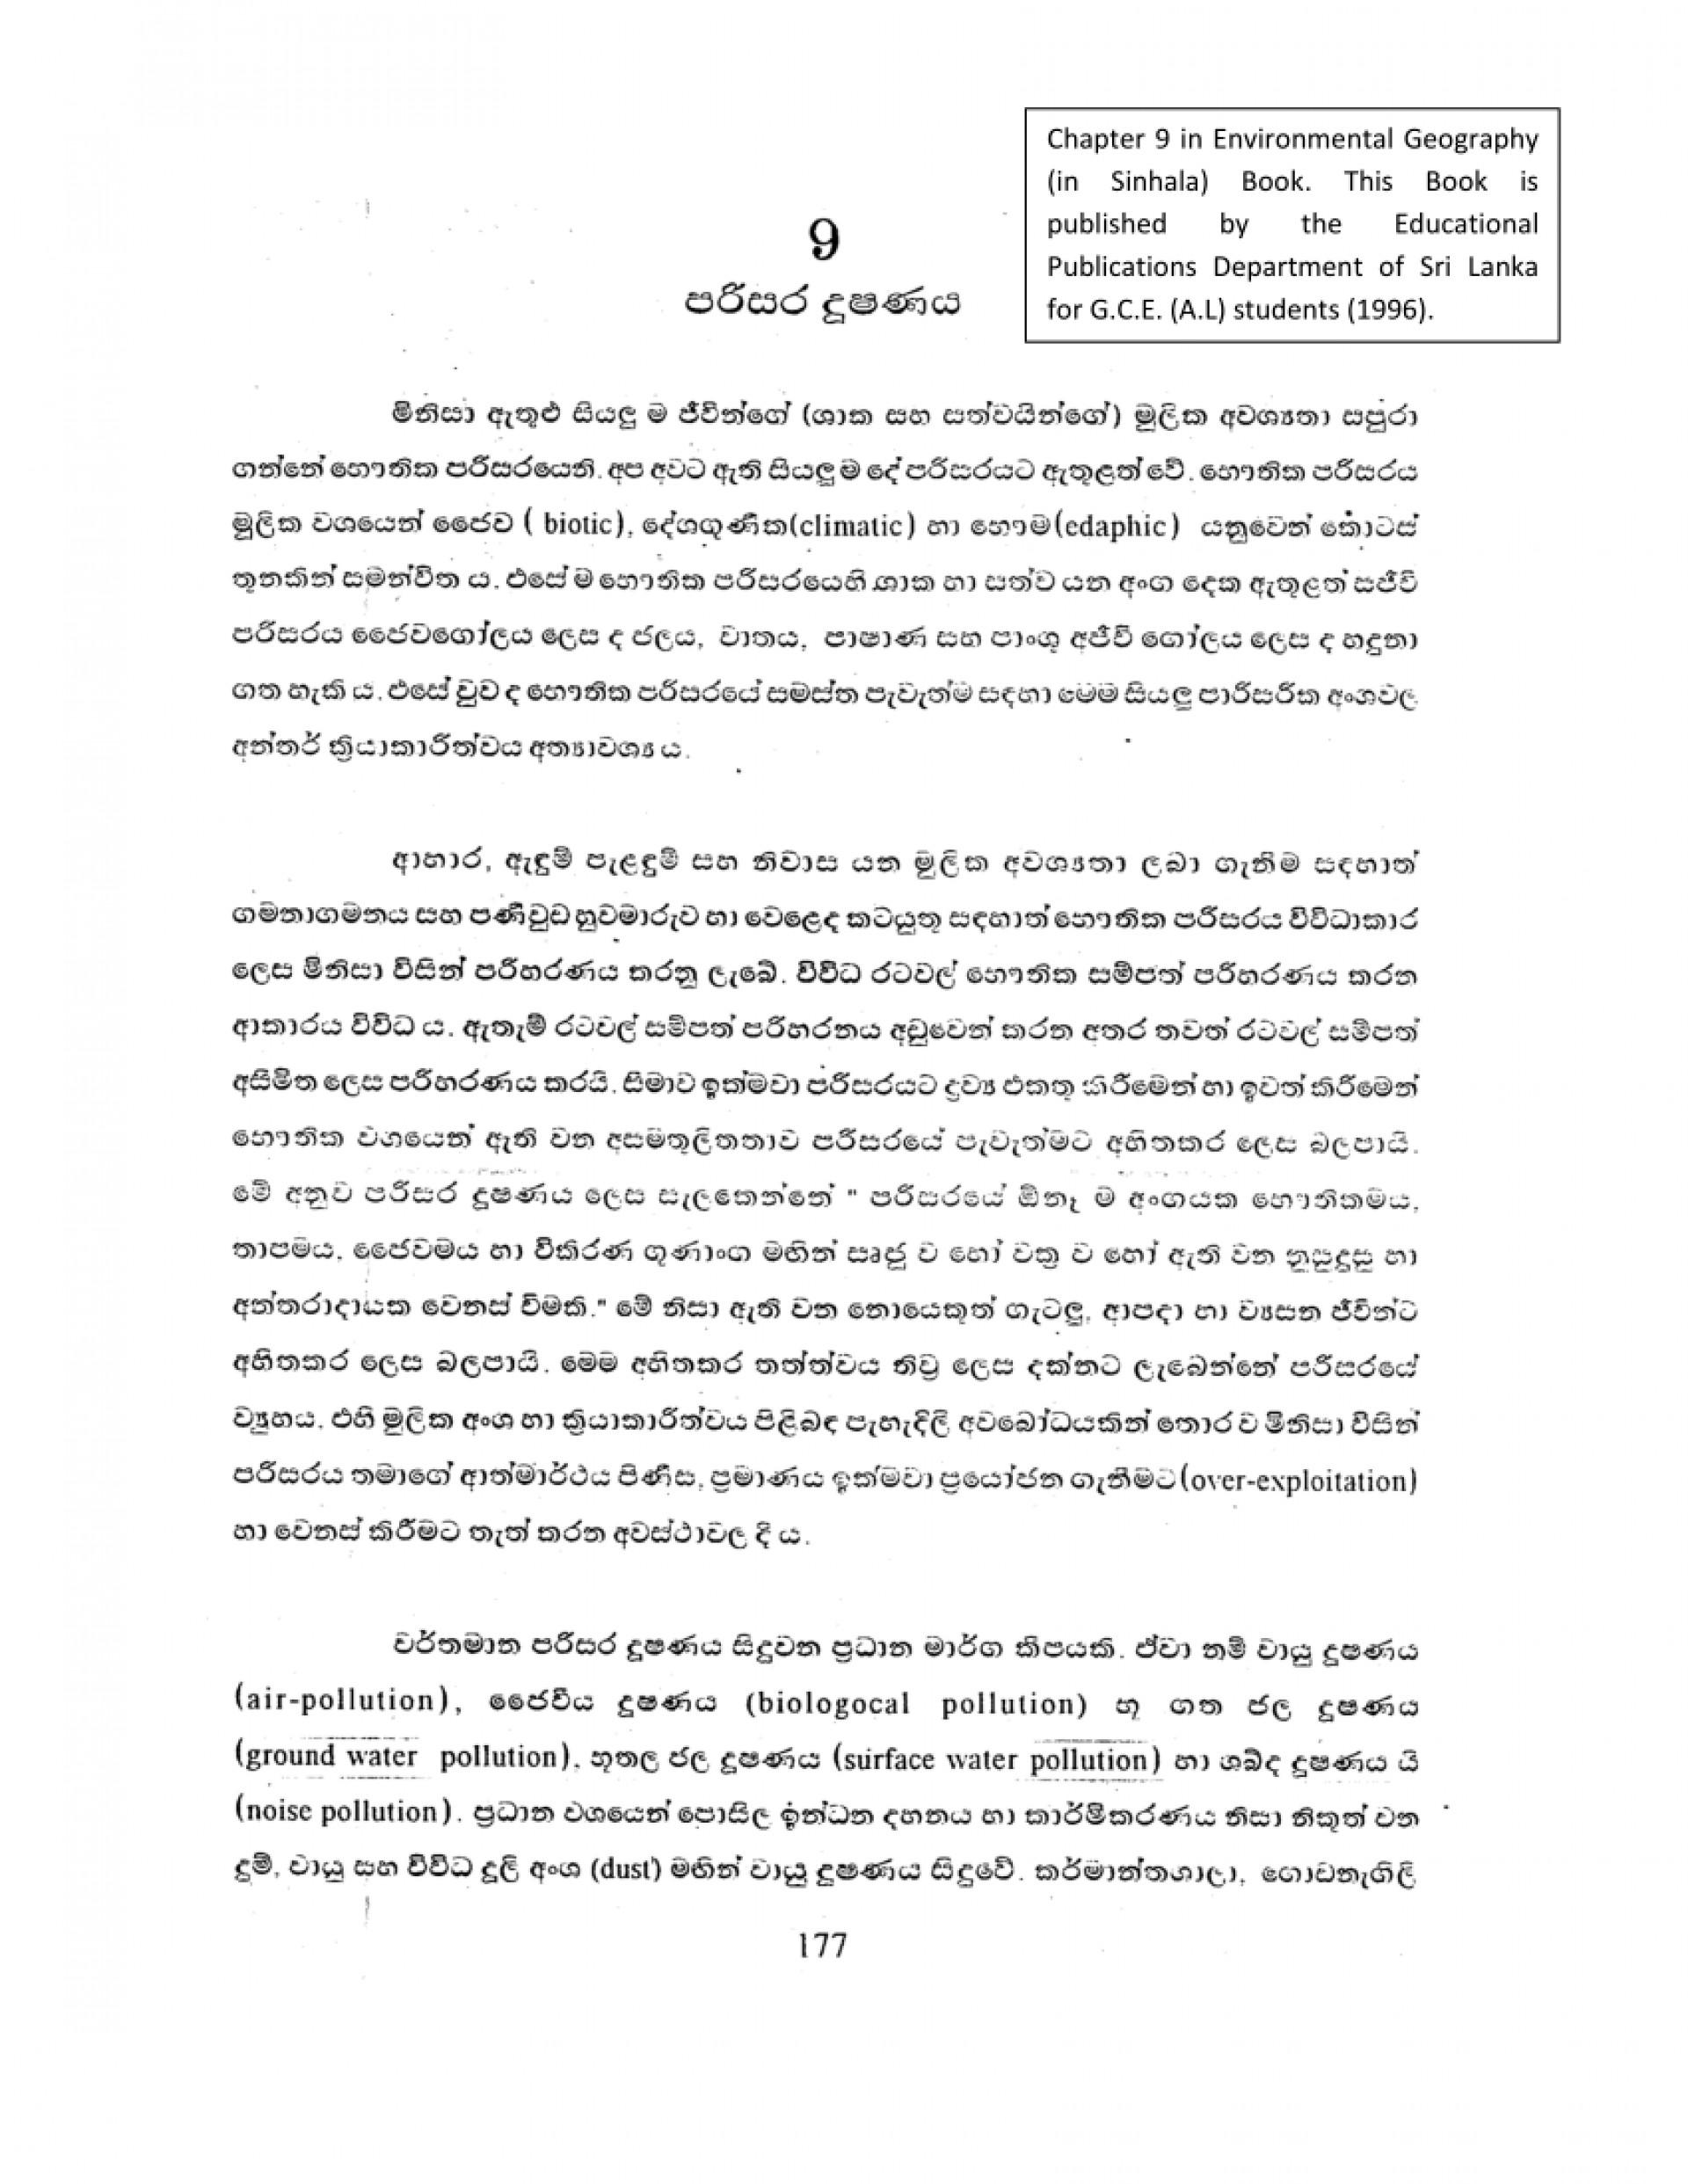 006 Maxresdefault Essay Example An On Environmental ~ Thatsnotus